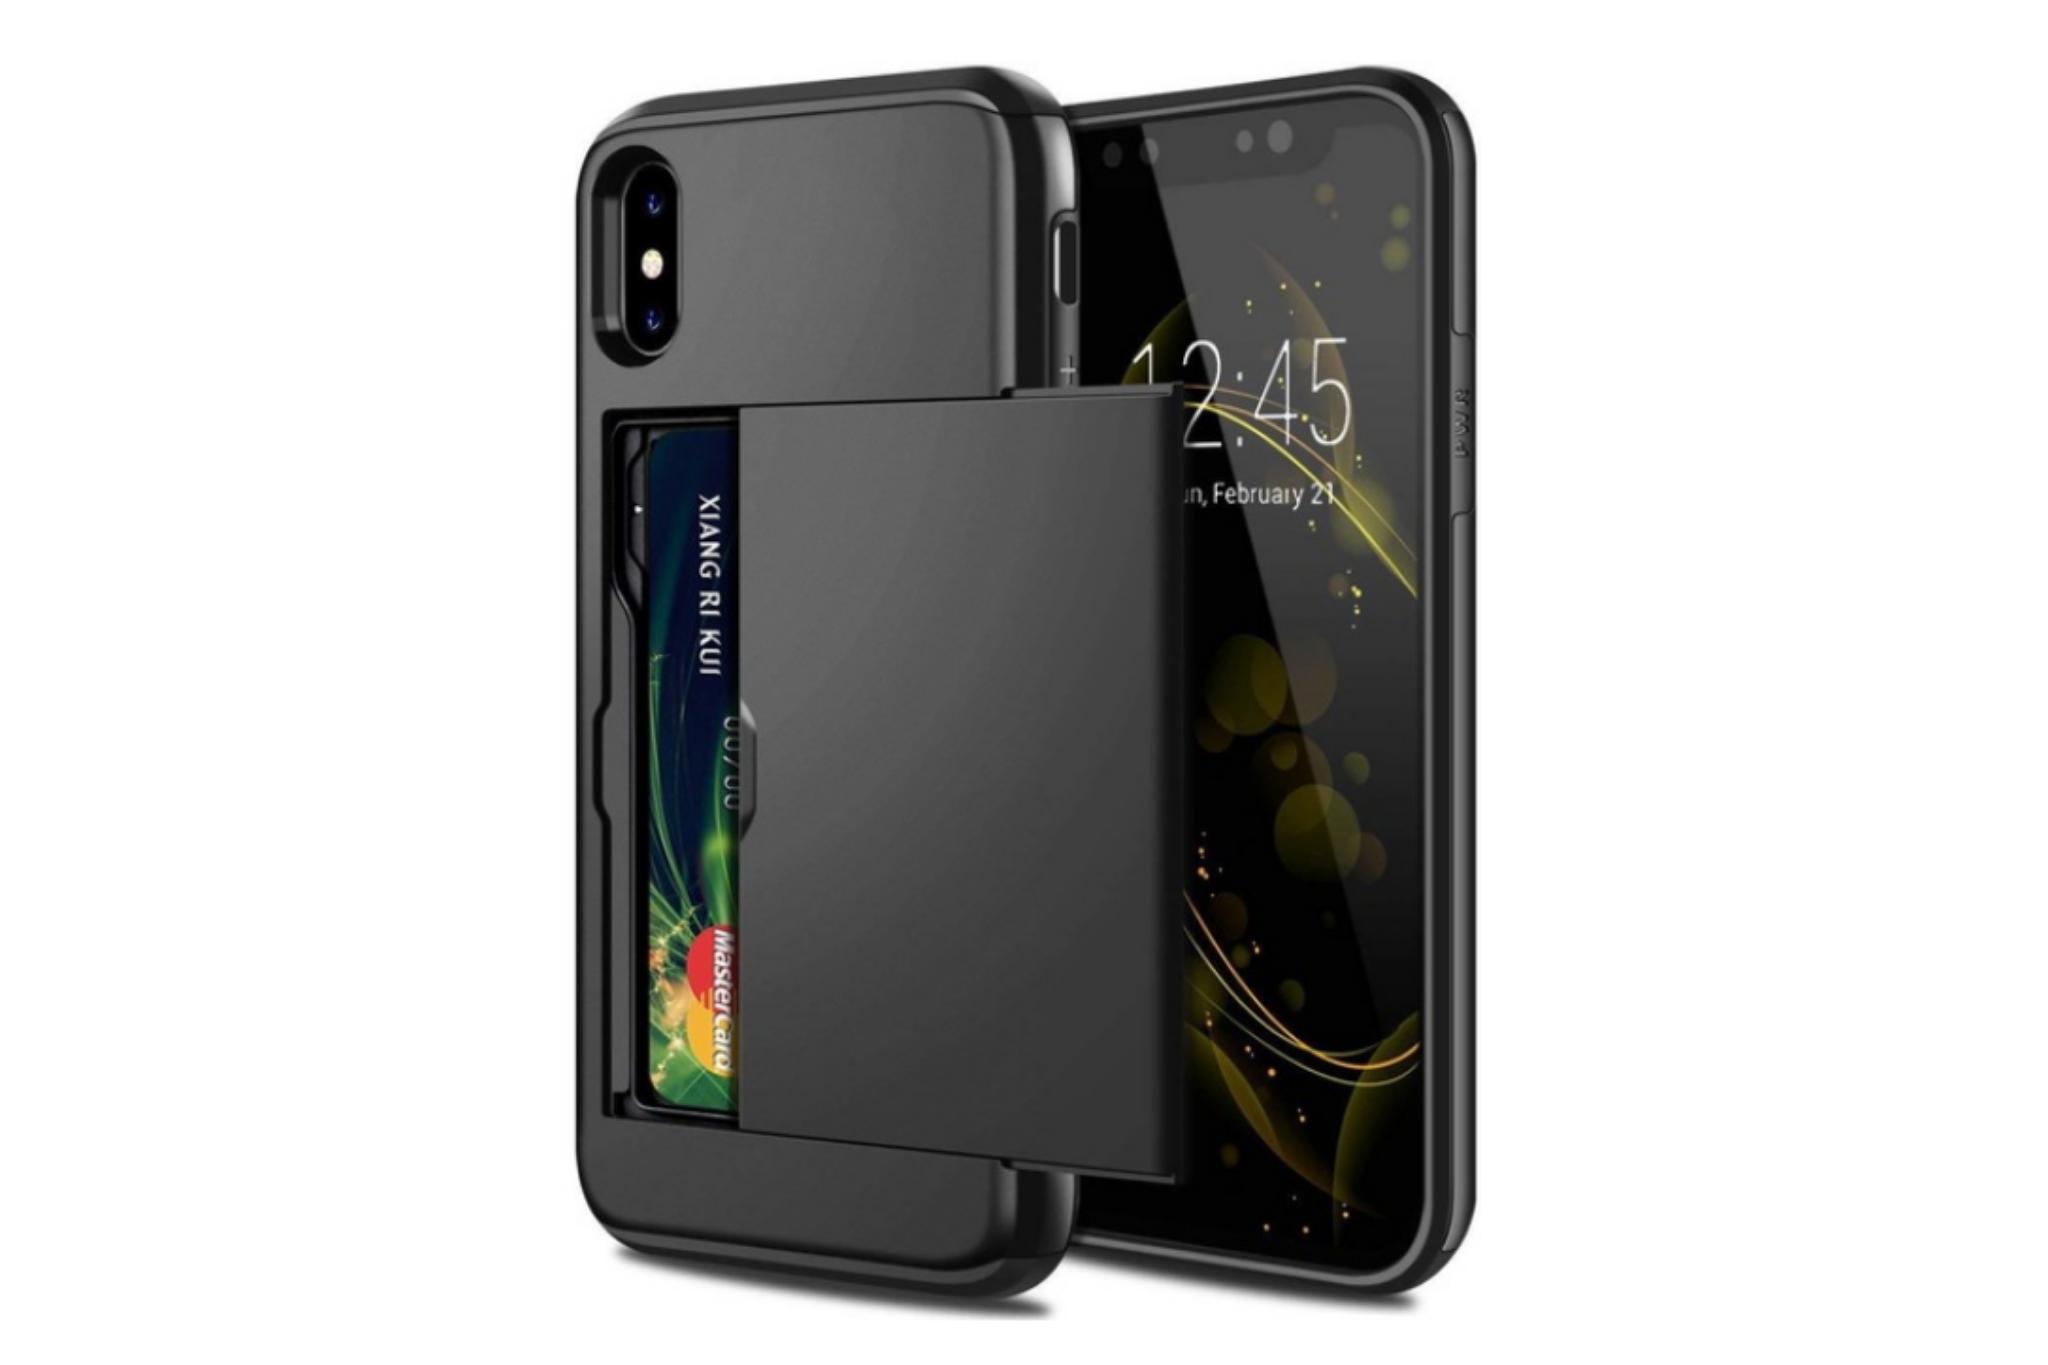 Smartphonehoesje iPhone 12 Mini | Pasjesschuif zwart